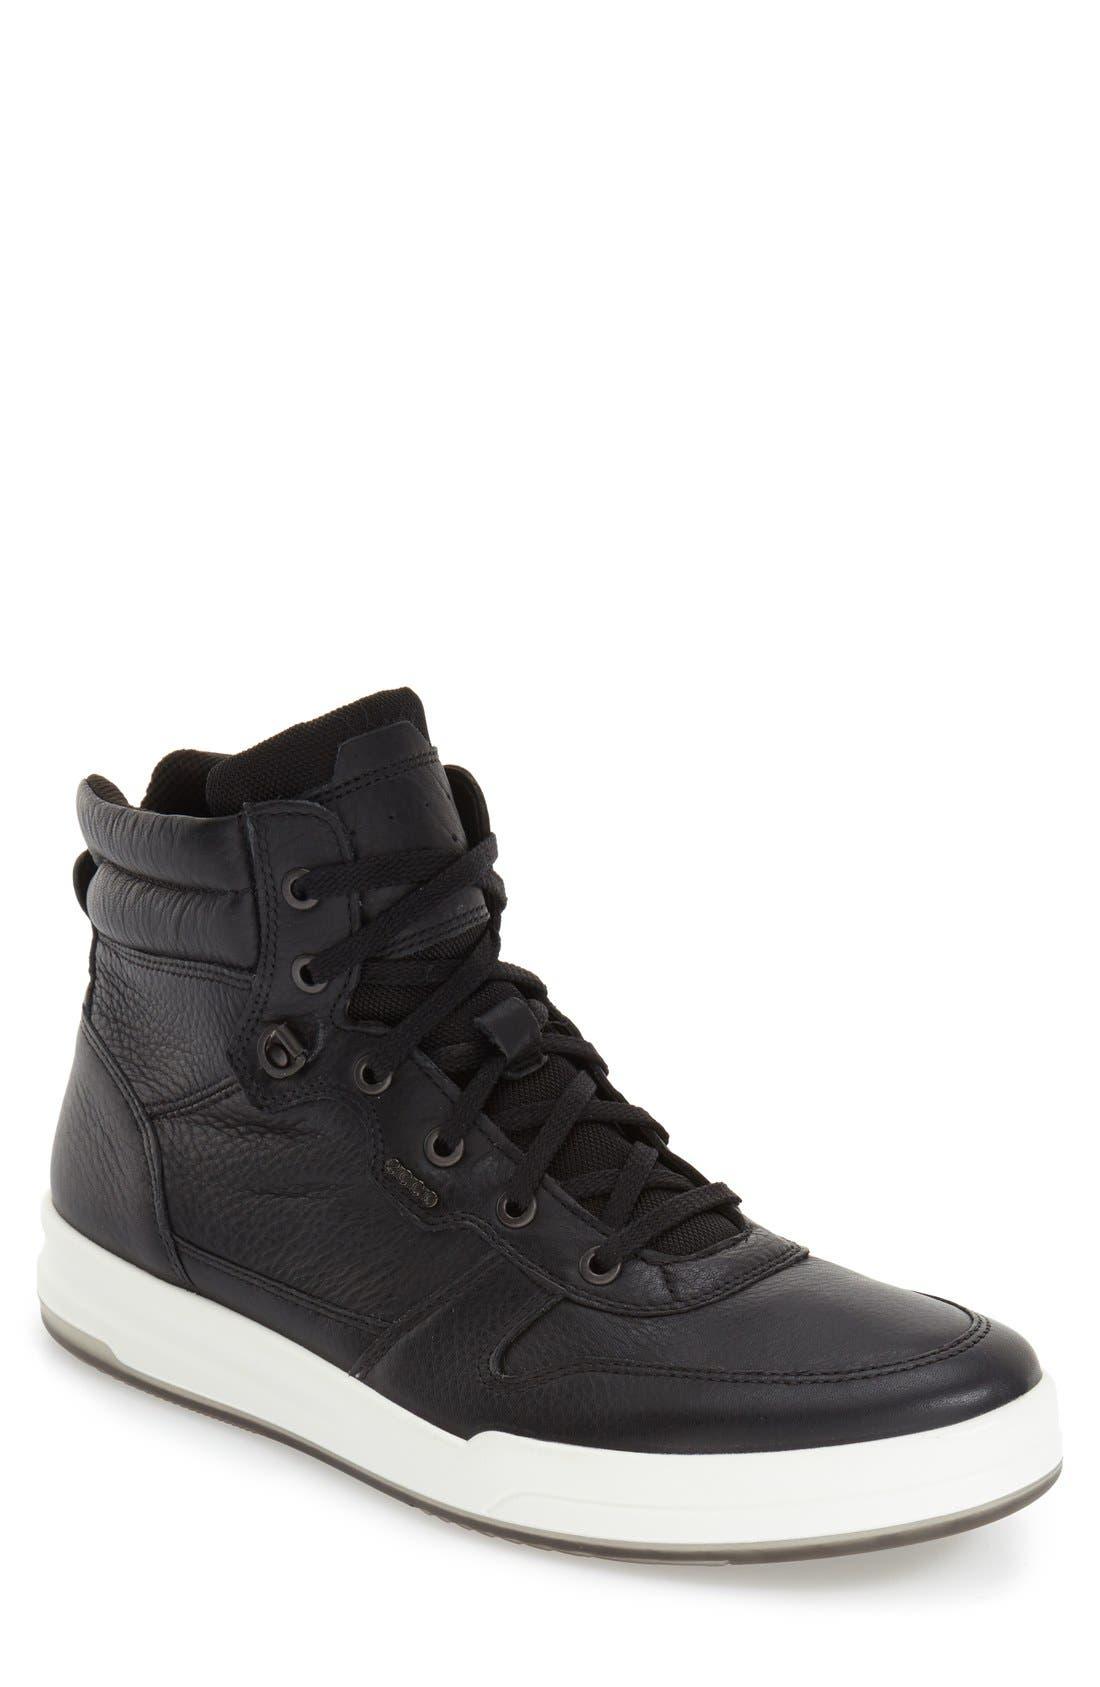 'Jack' High Top Sneaker,                             Main thumbnail 1, color,                             001